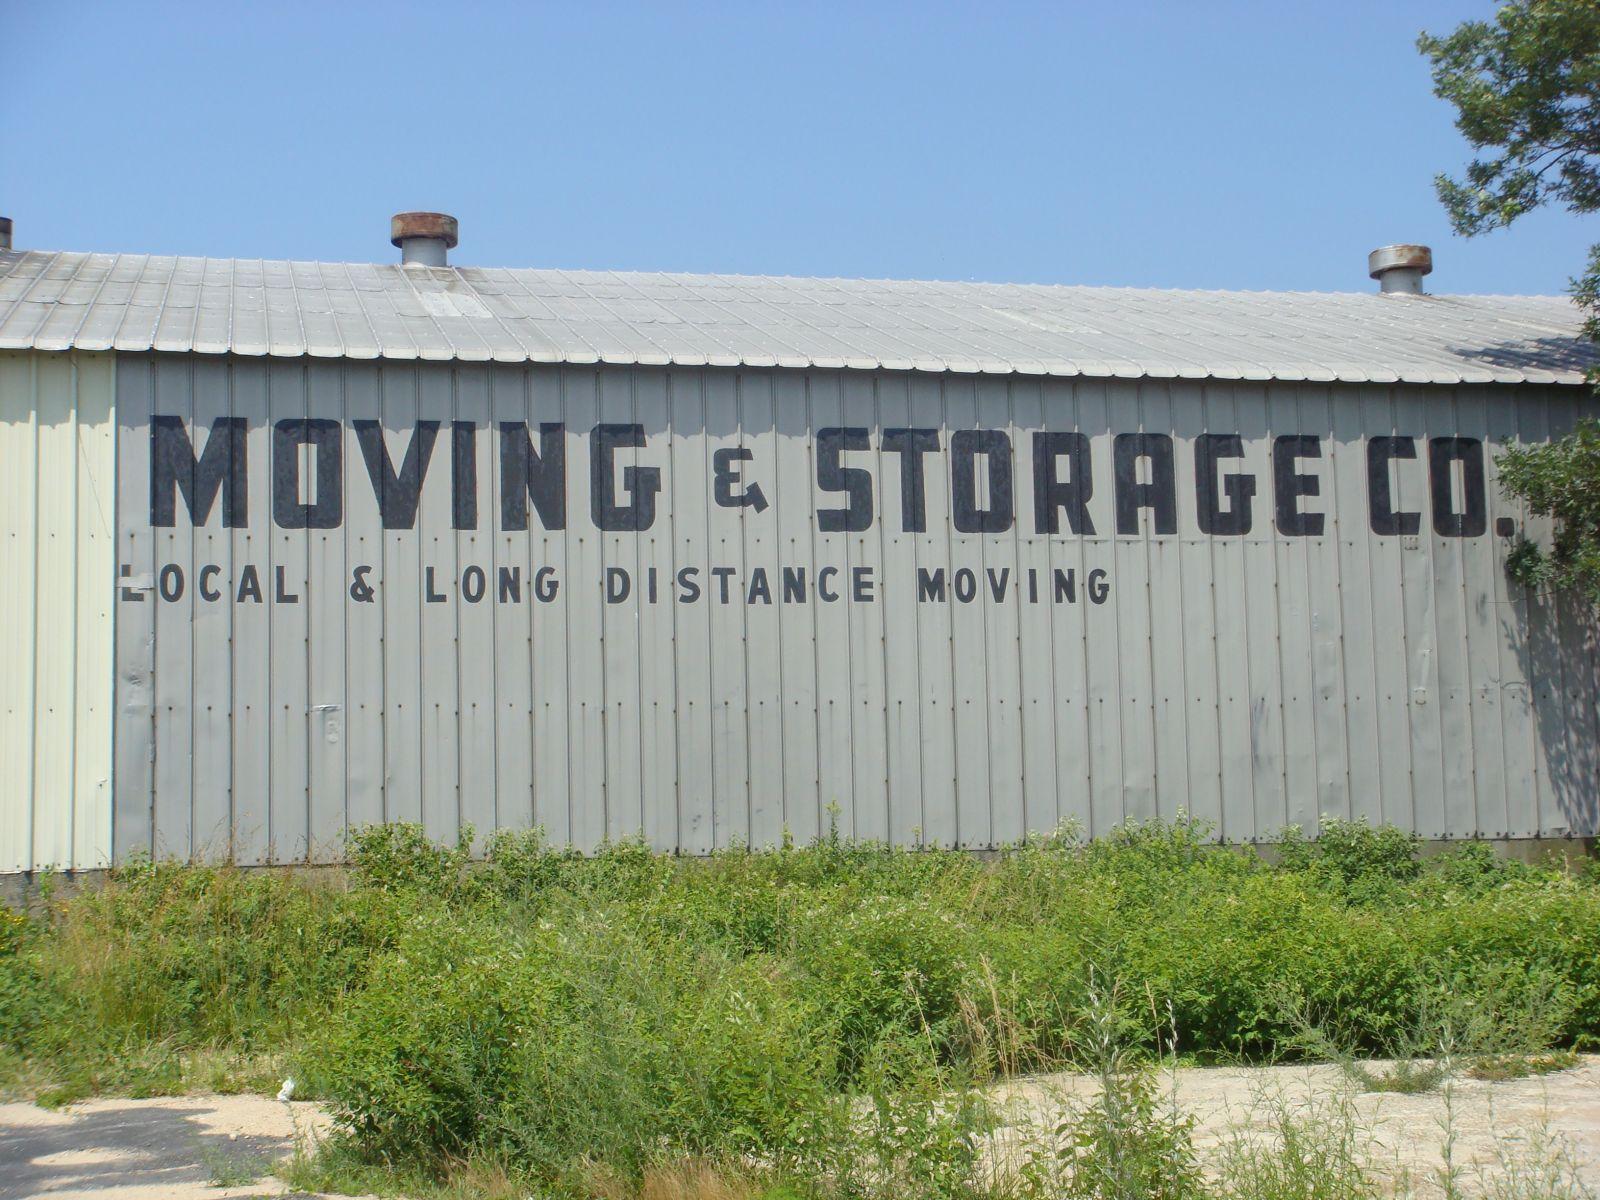 Moving & Storage Co. | Bearses Way, Hyannis | Nick Sherman | Flickr